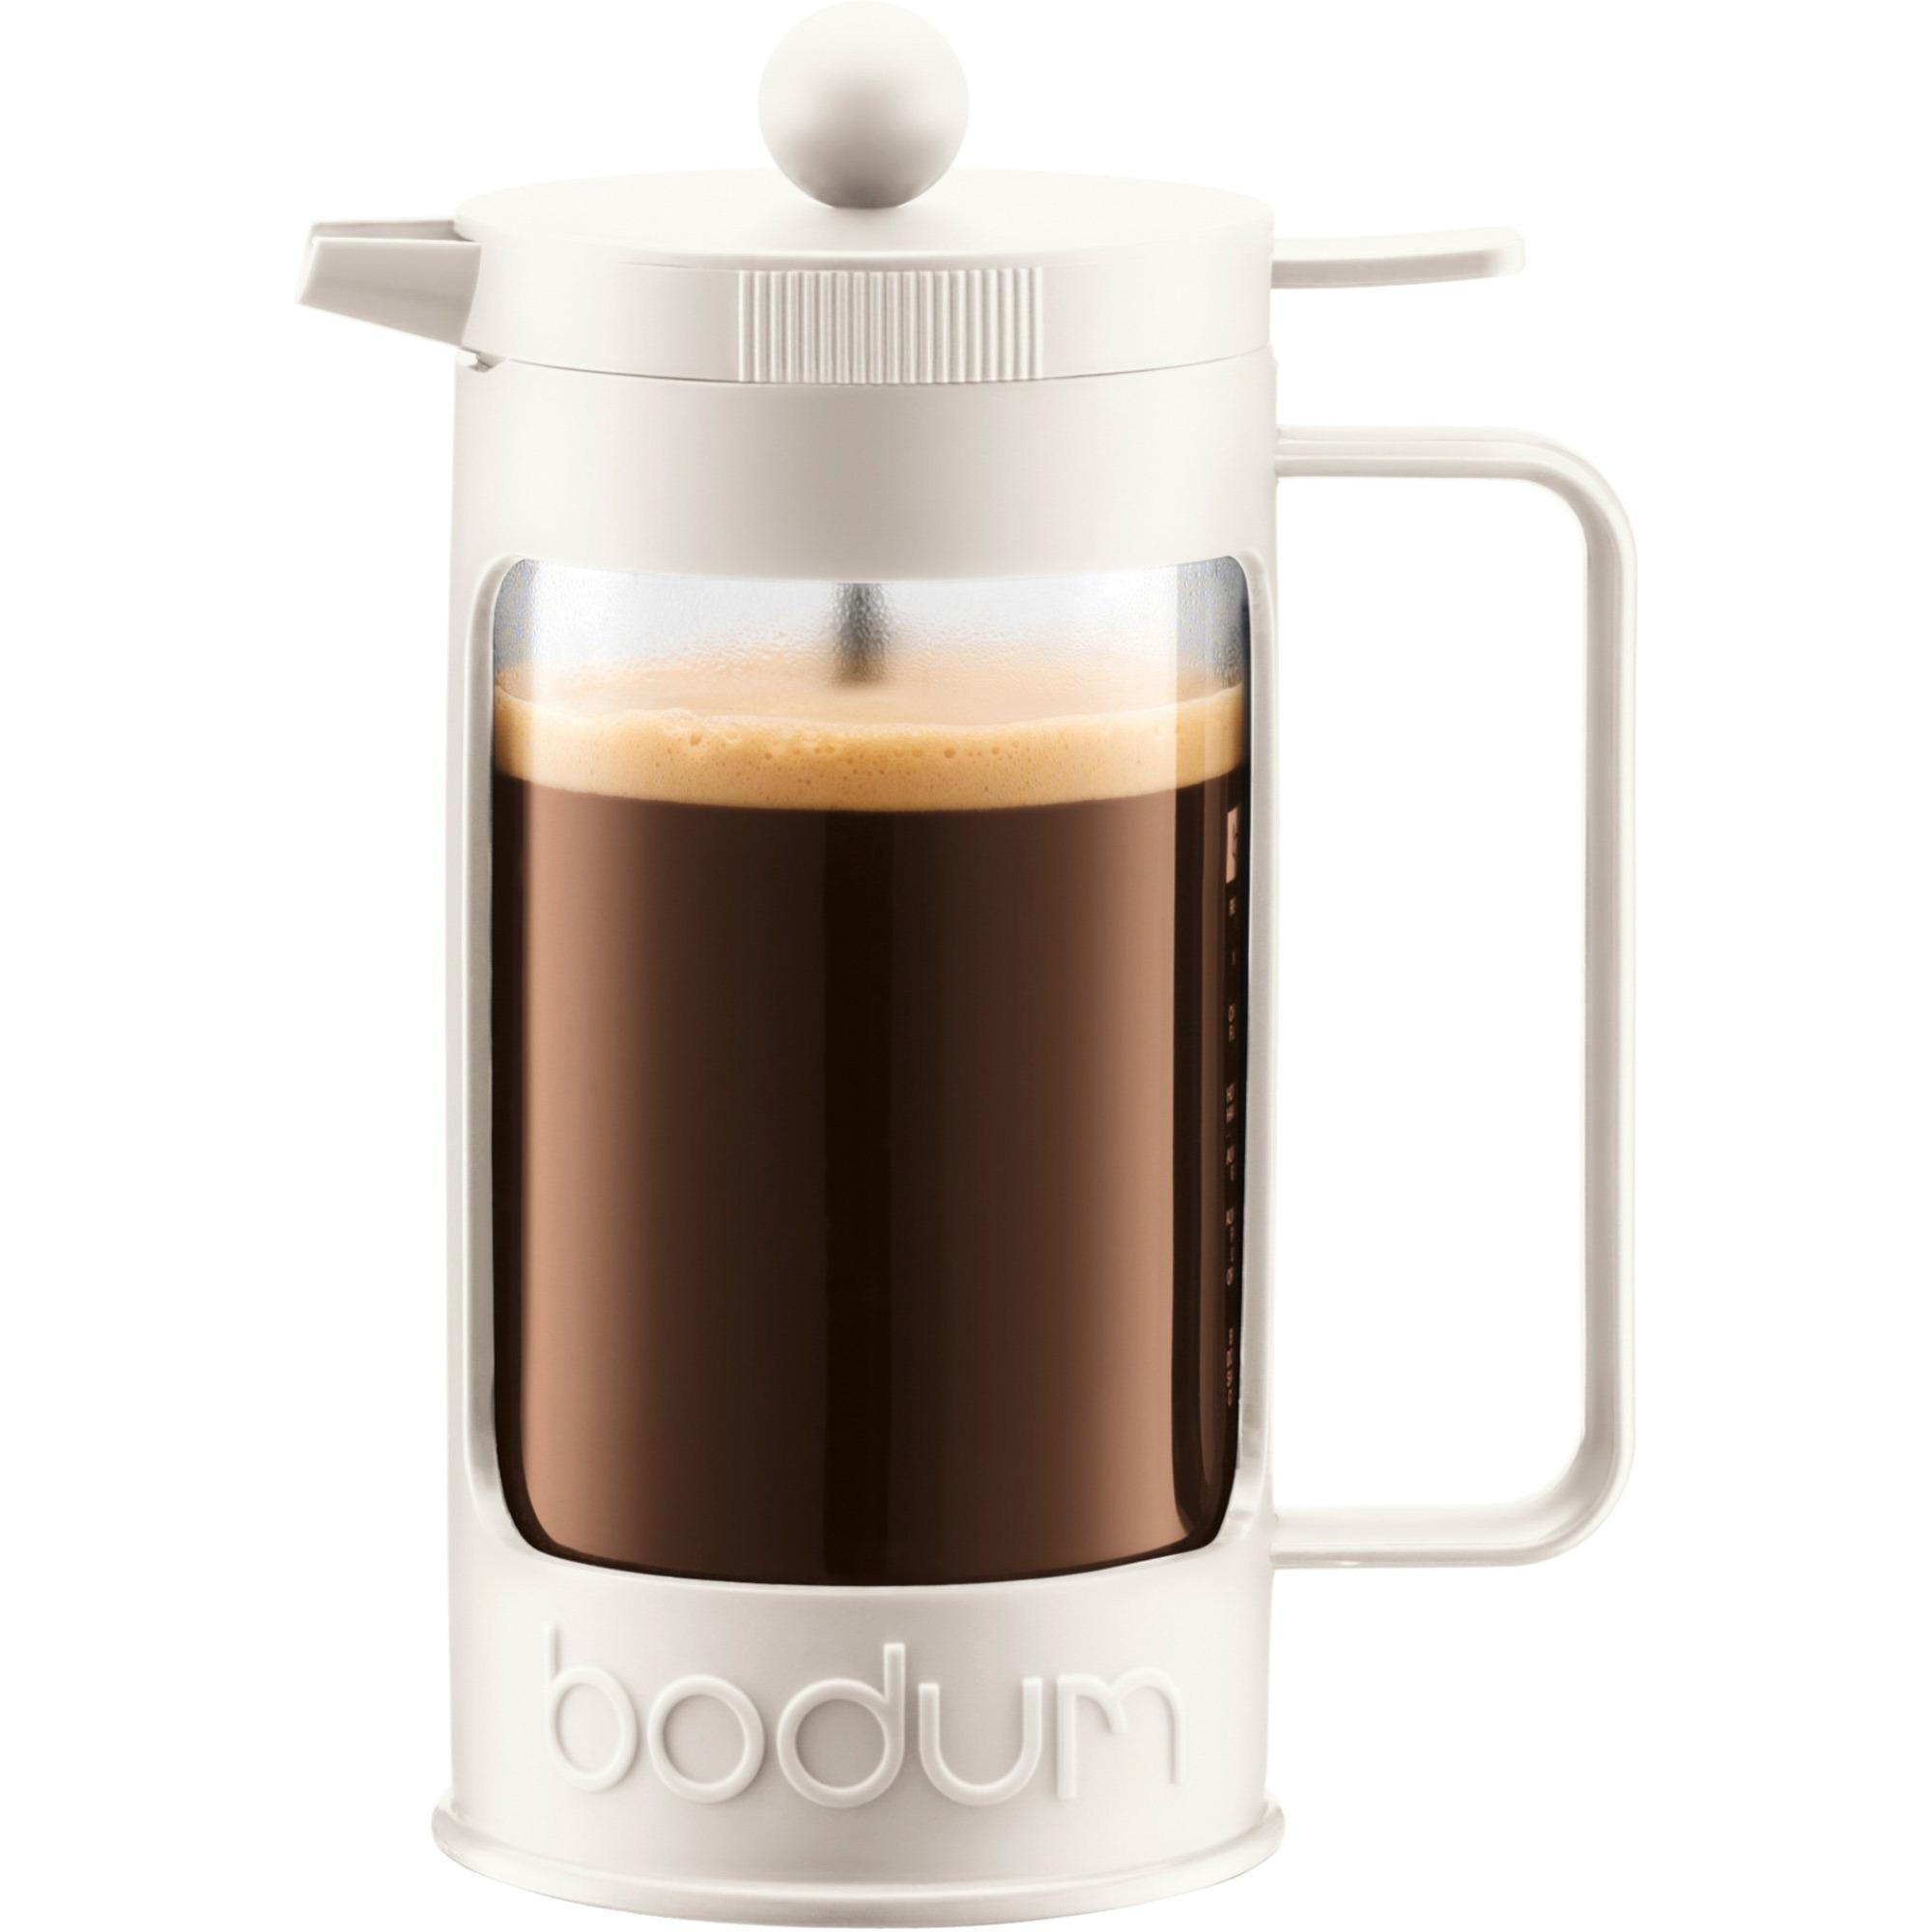 Bodum Bean Vit Pressbryggare 3 Koppar 035 l